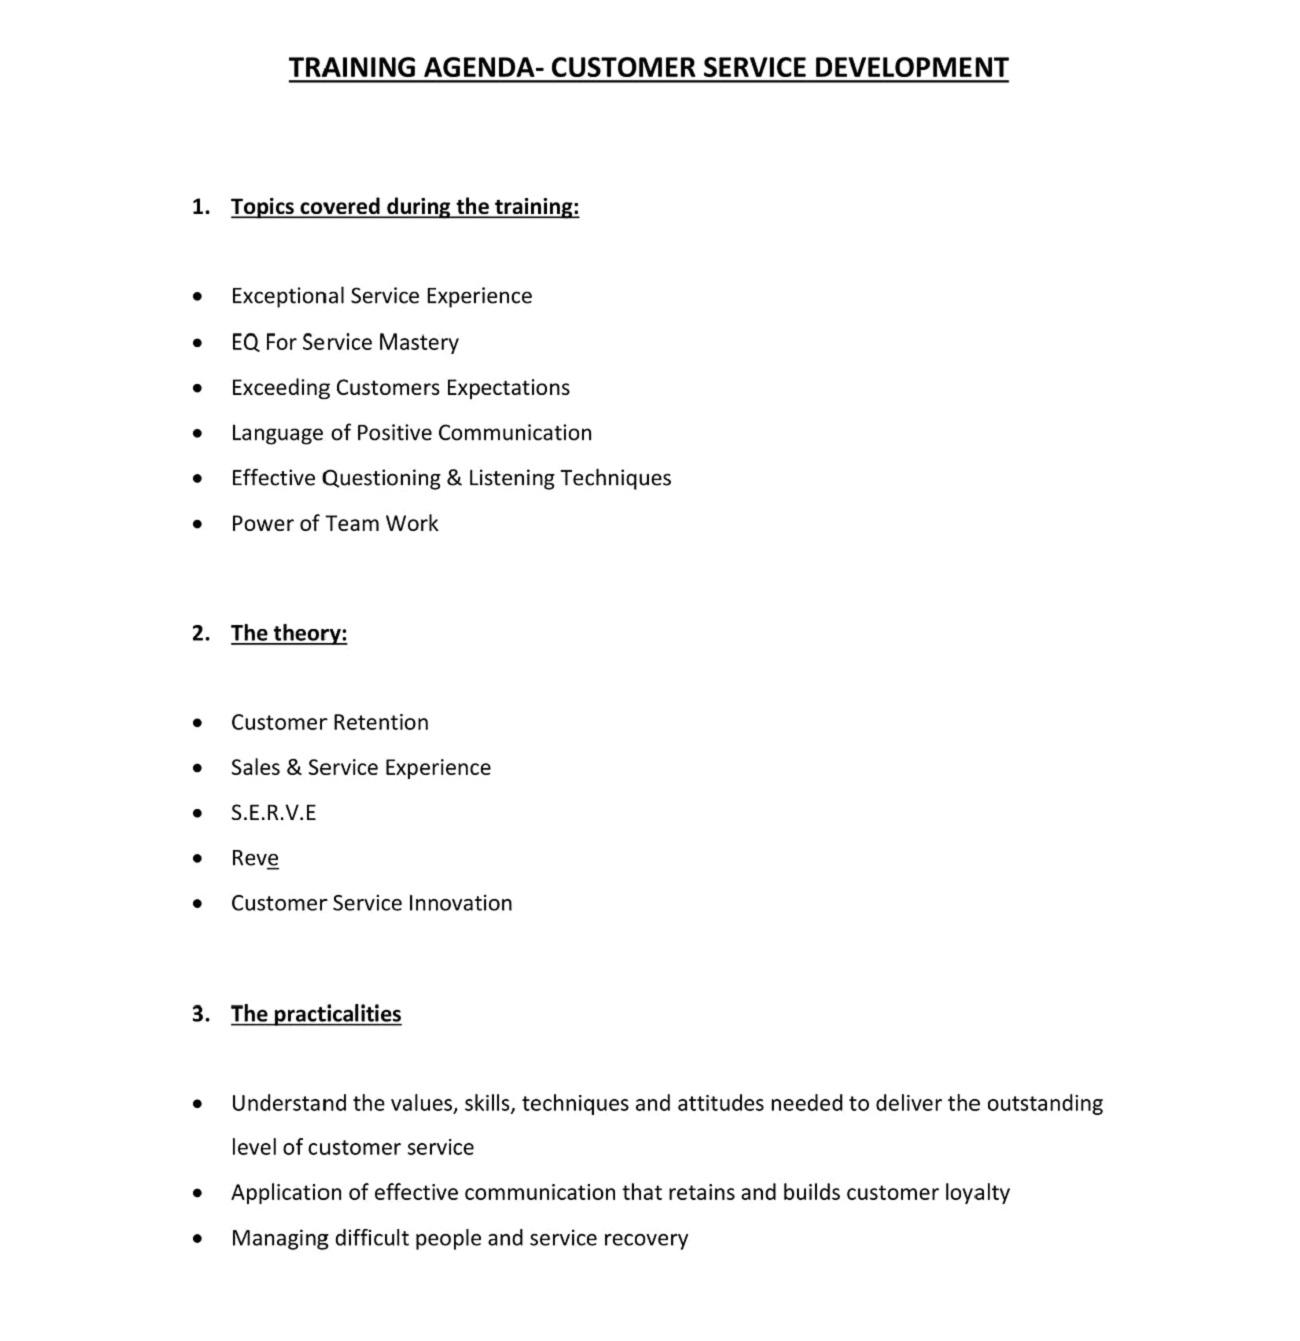 Customer Service Training Agenda PDF Sample Template Microsoft Word Ppt How To Create A Pdf Layout  Full